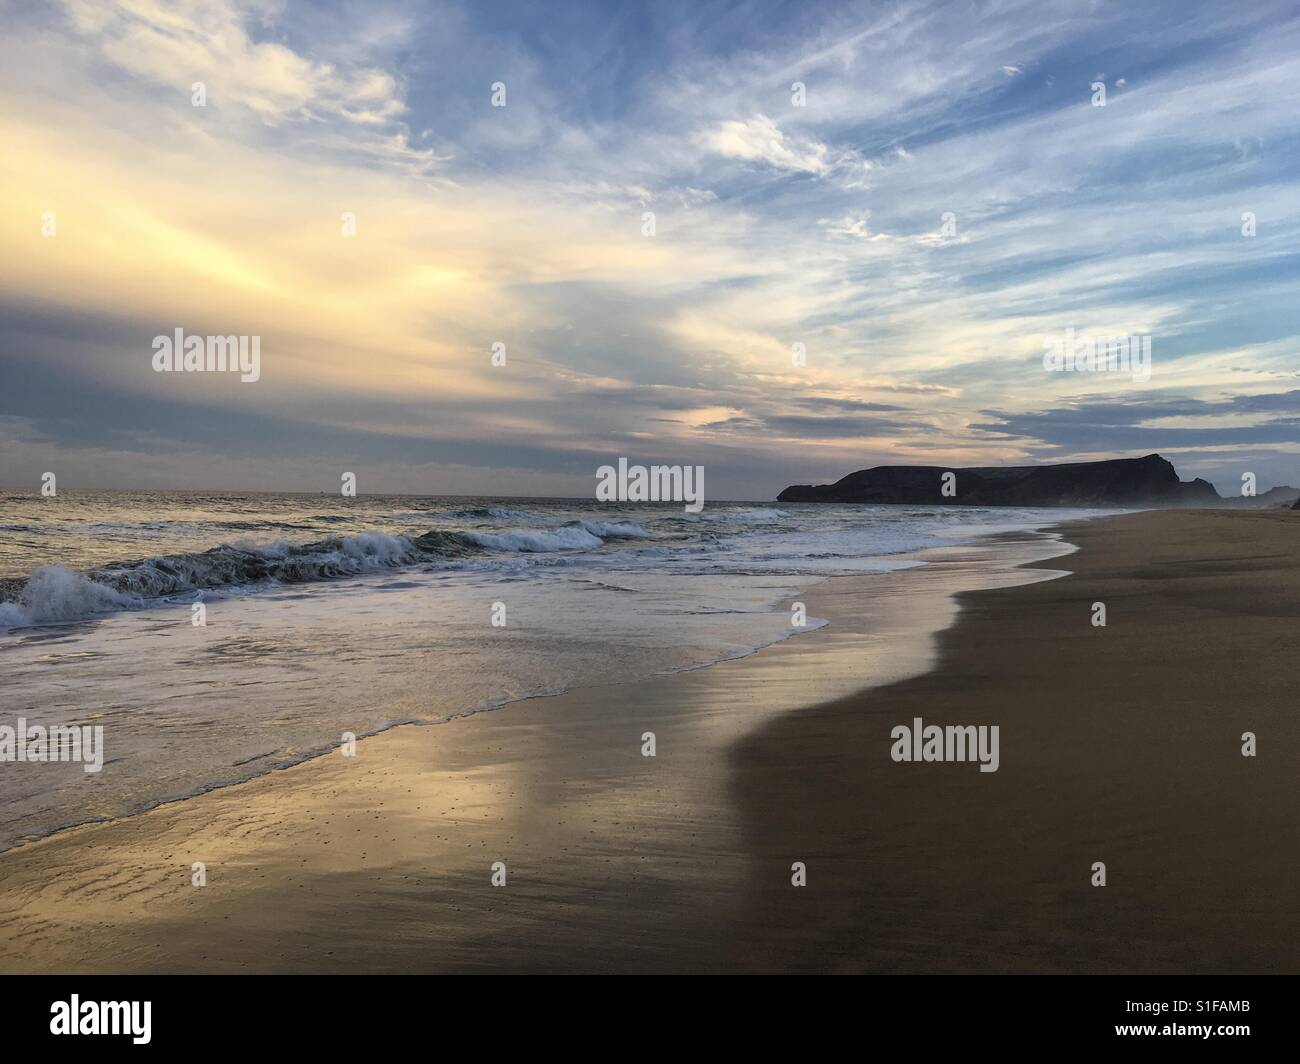 Sunset skies over the beach at Porto Santo, Madeira - Stock Image